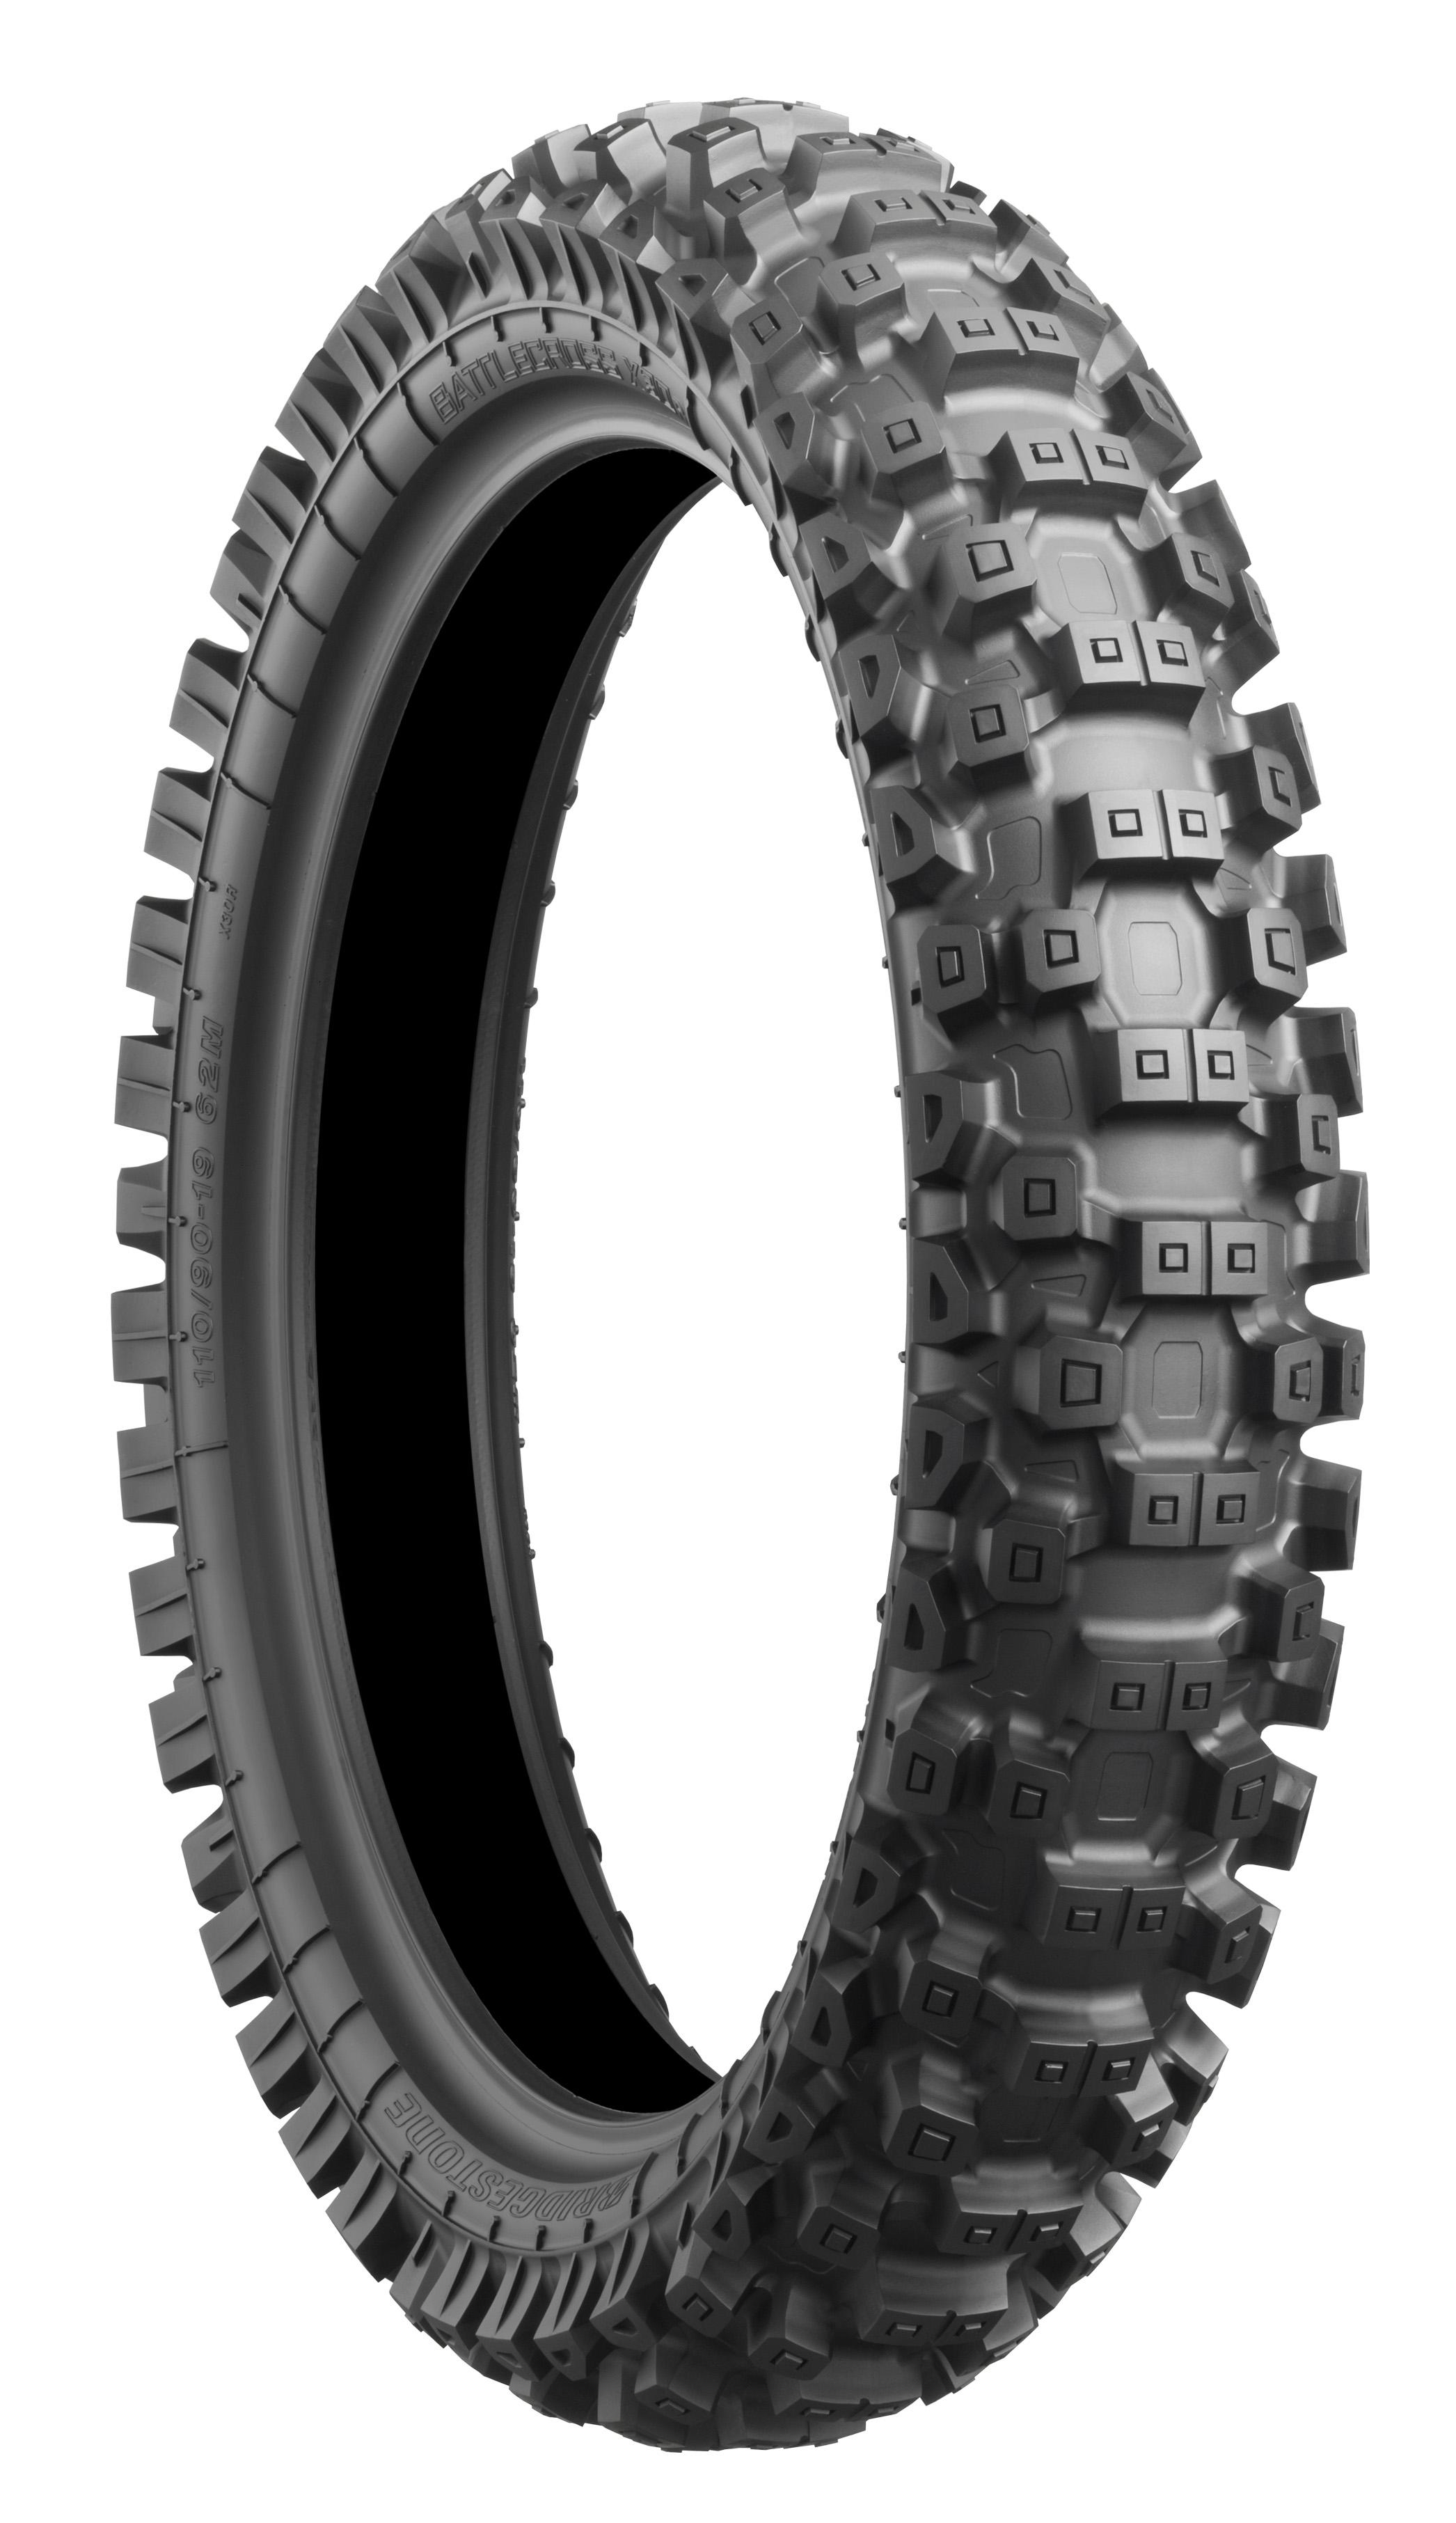 Bridgestone Battlecross X30 110/100-18 (64M) Medium Rear Tyre